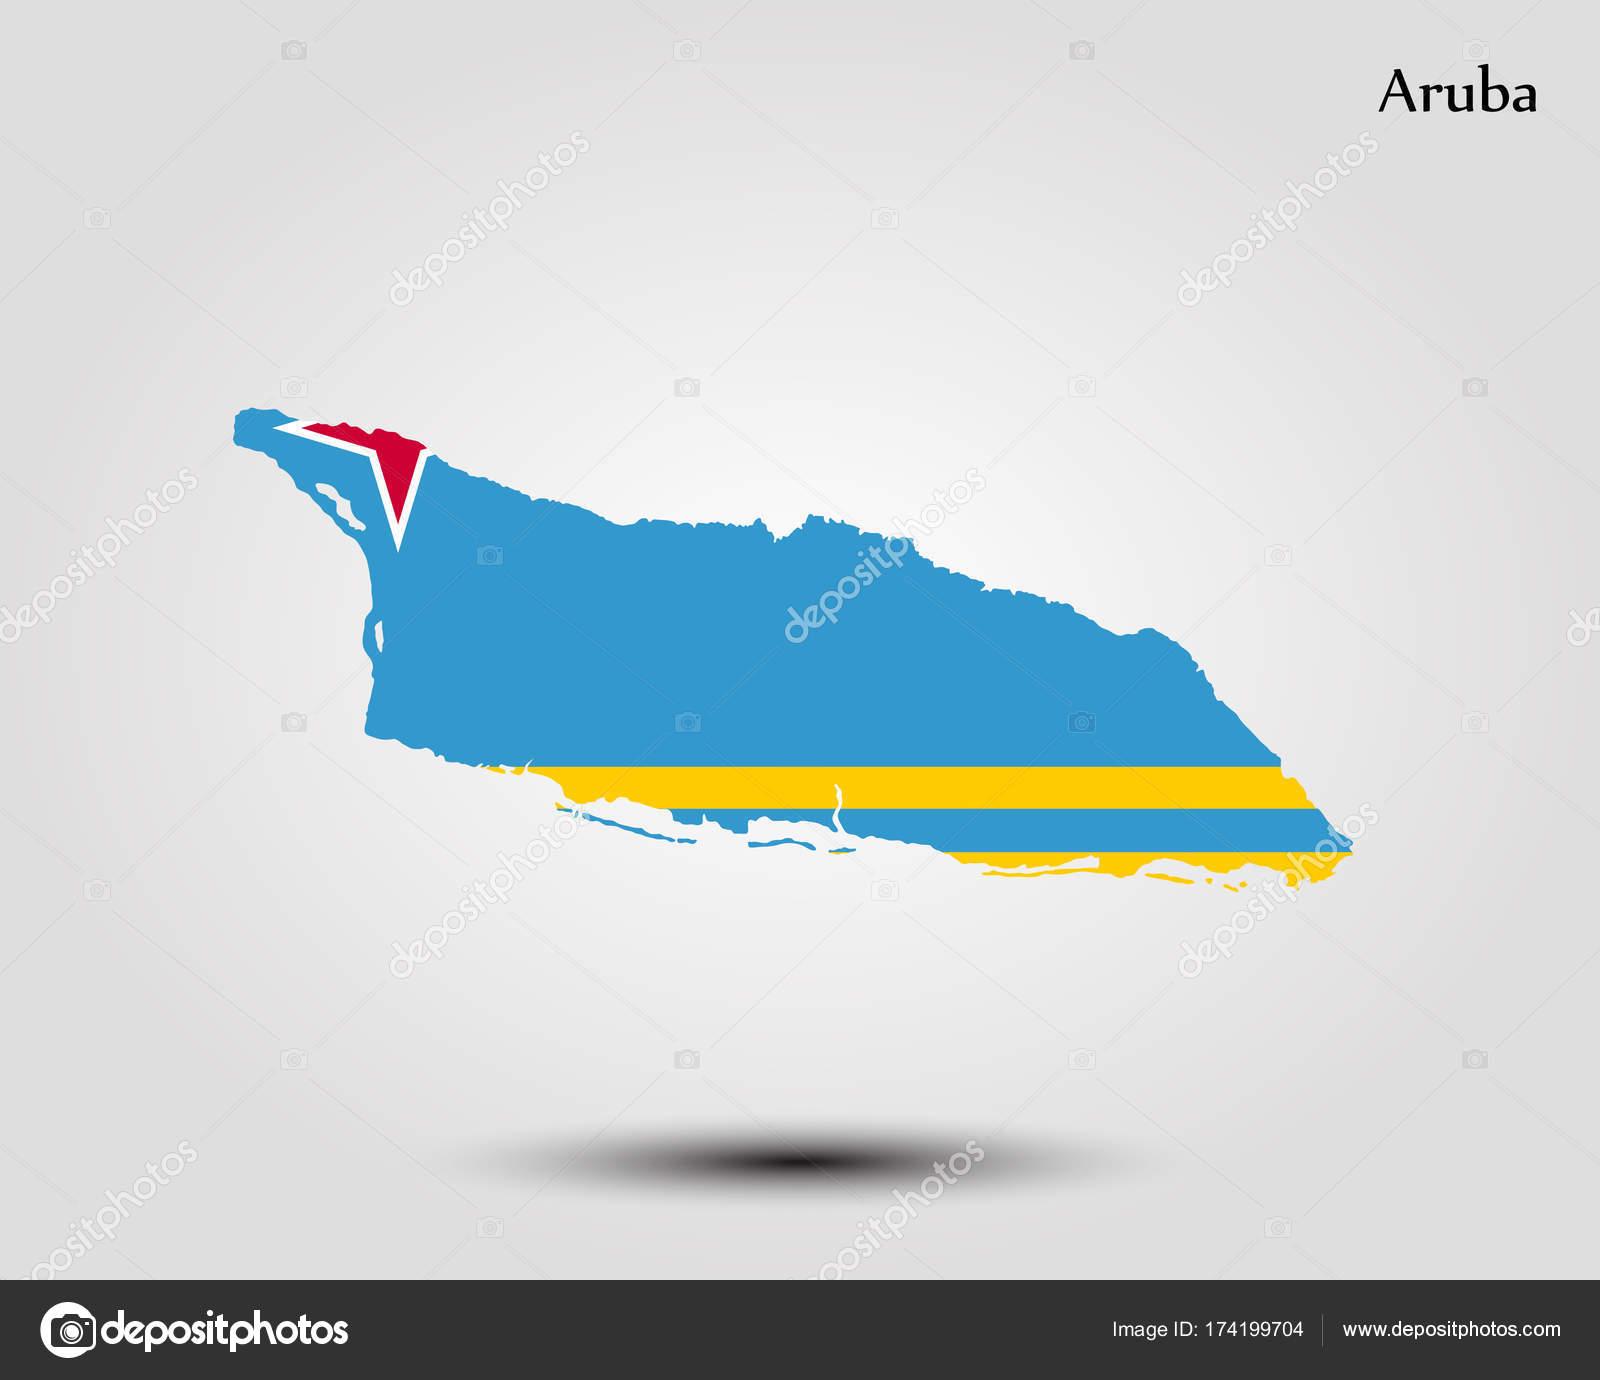 Map of Aruba — Stock Vector © Uglegorets #174199704